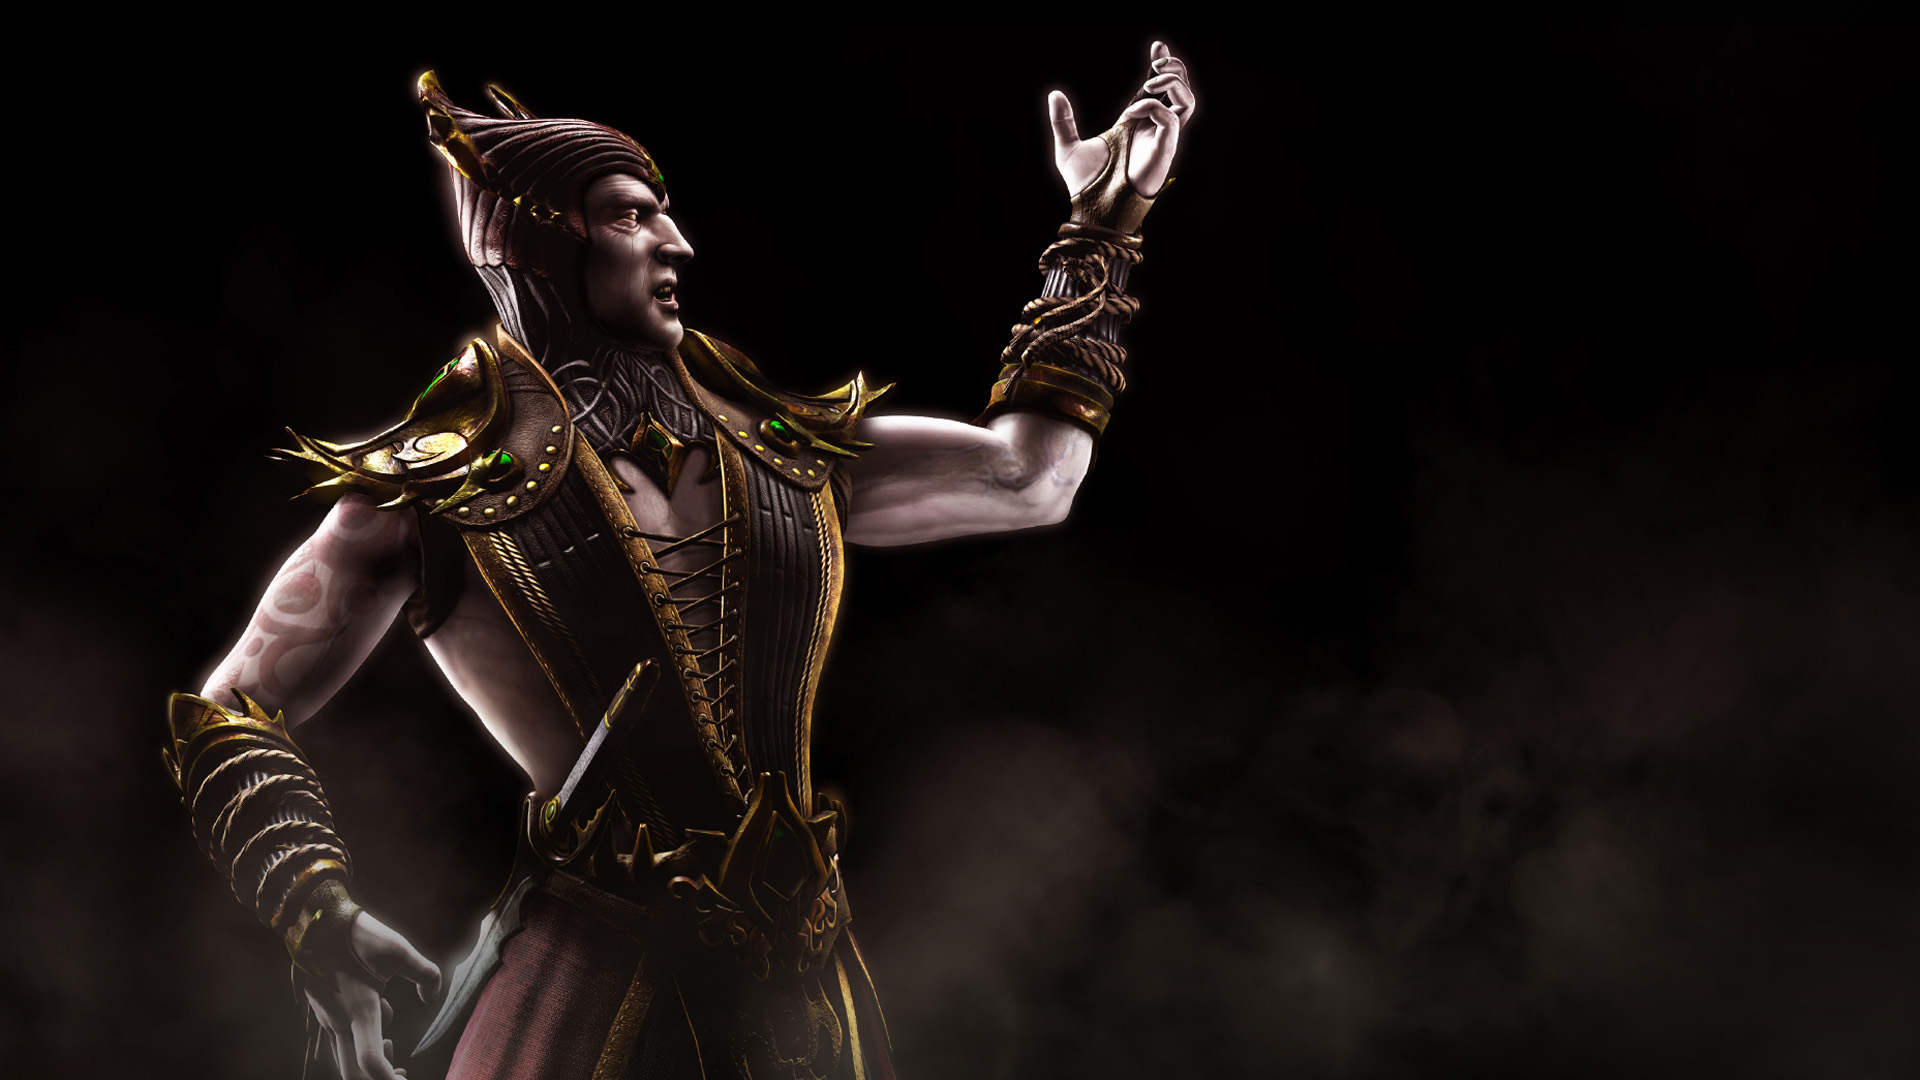 Mortal Kombat X - Shinnok | Steam Trading Cards Wiki ...